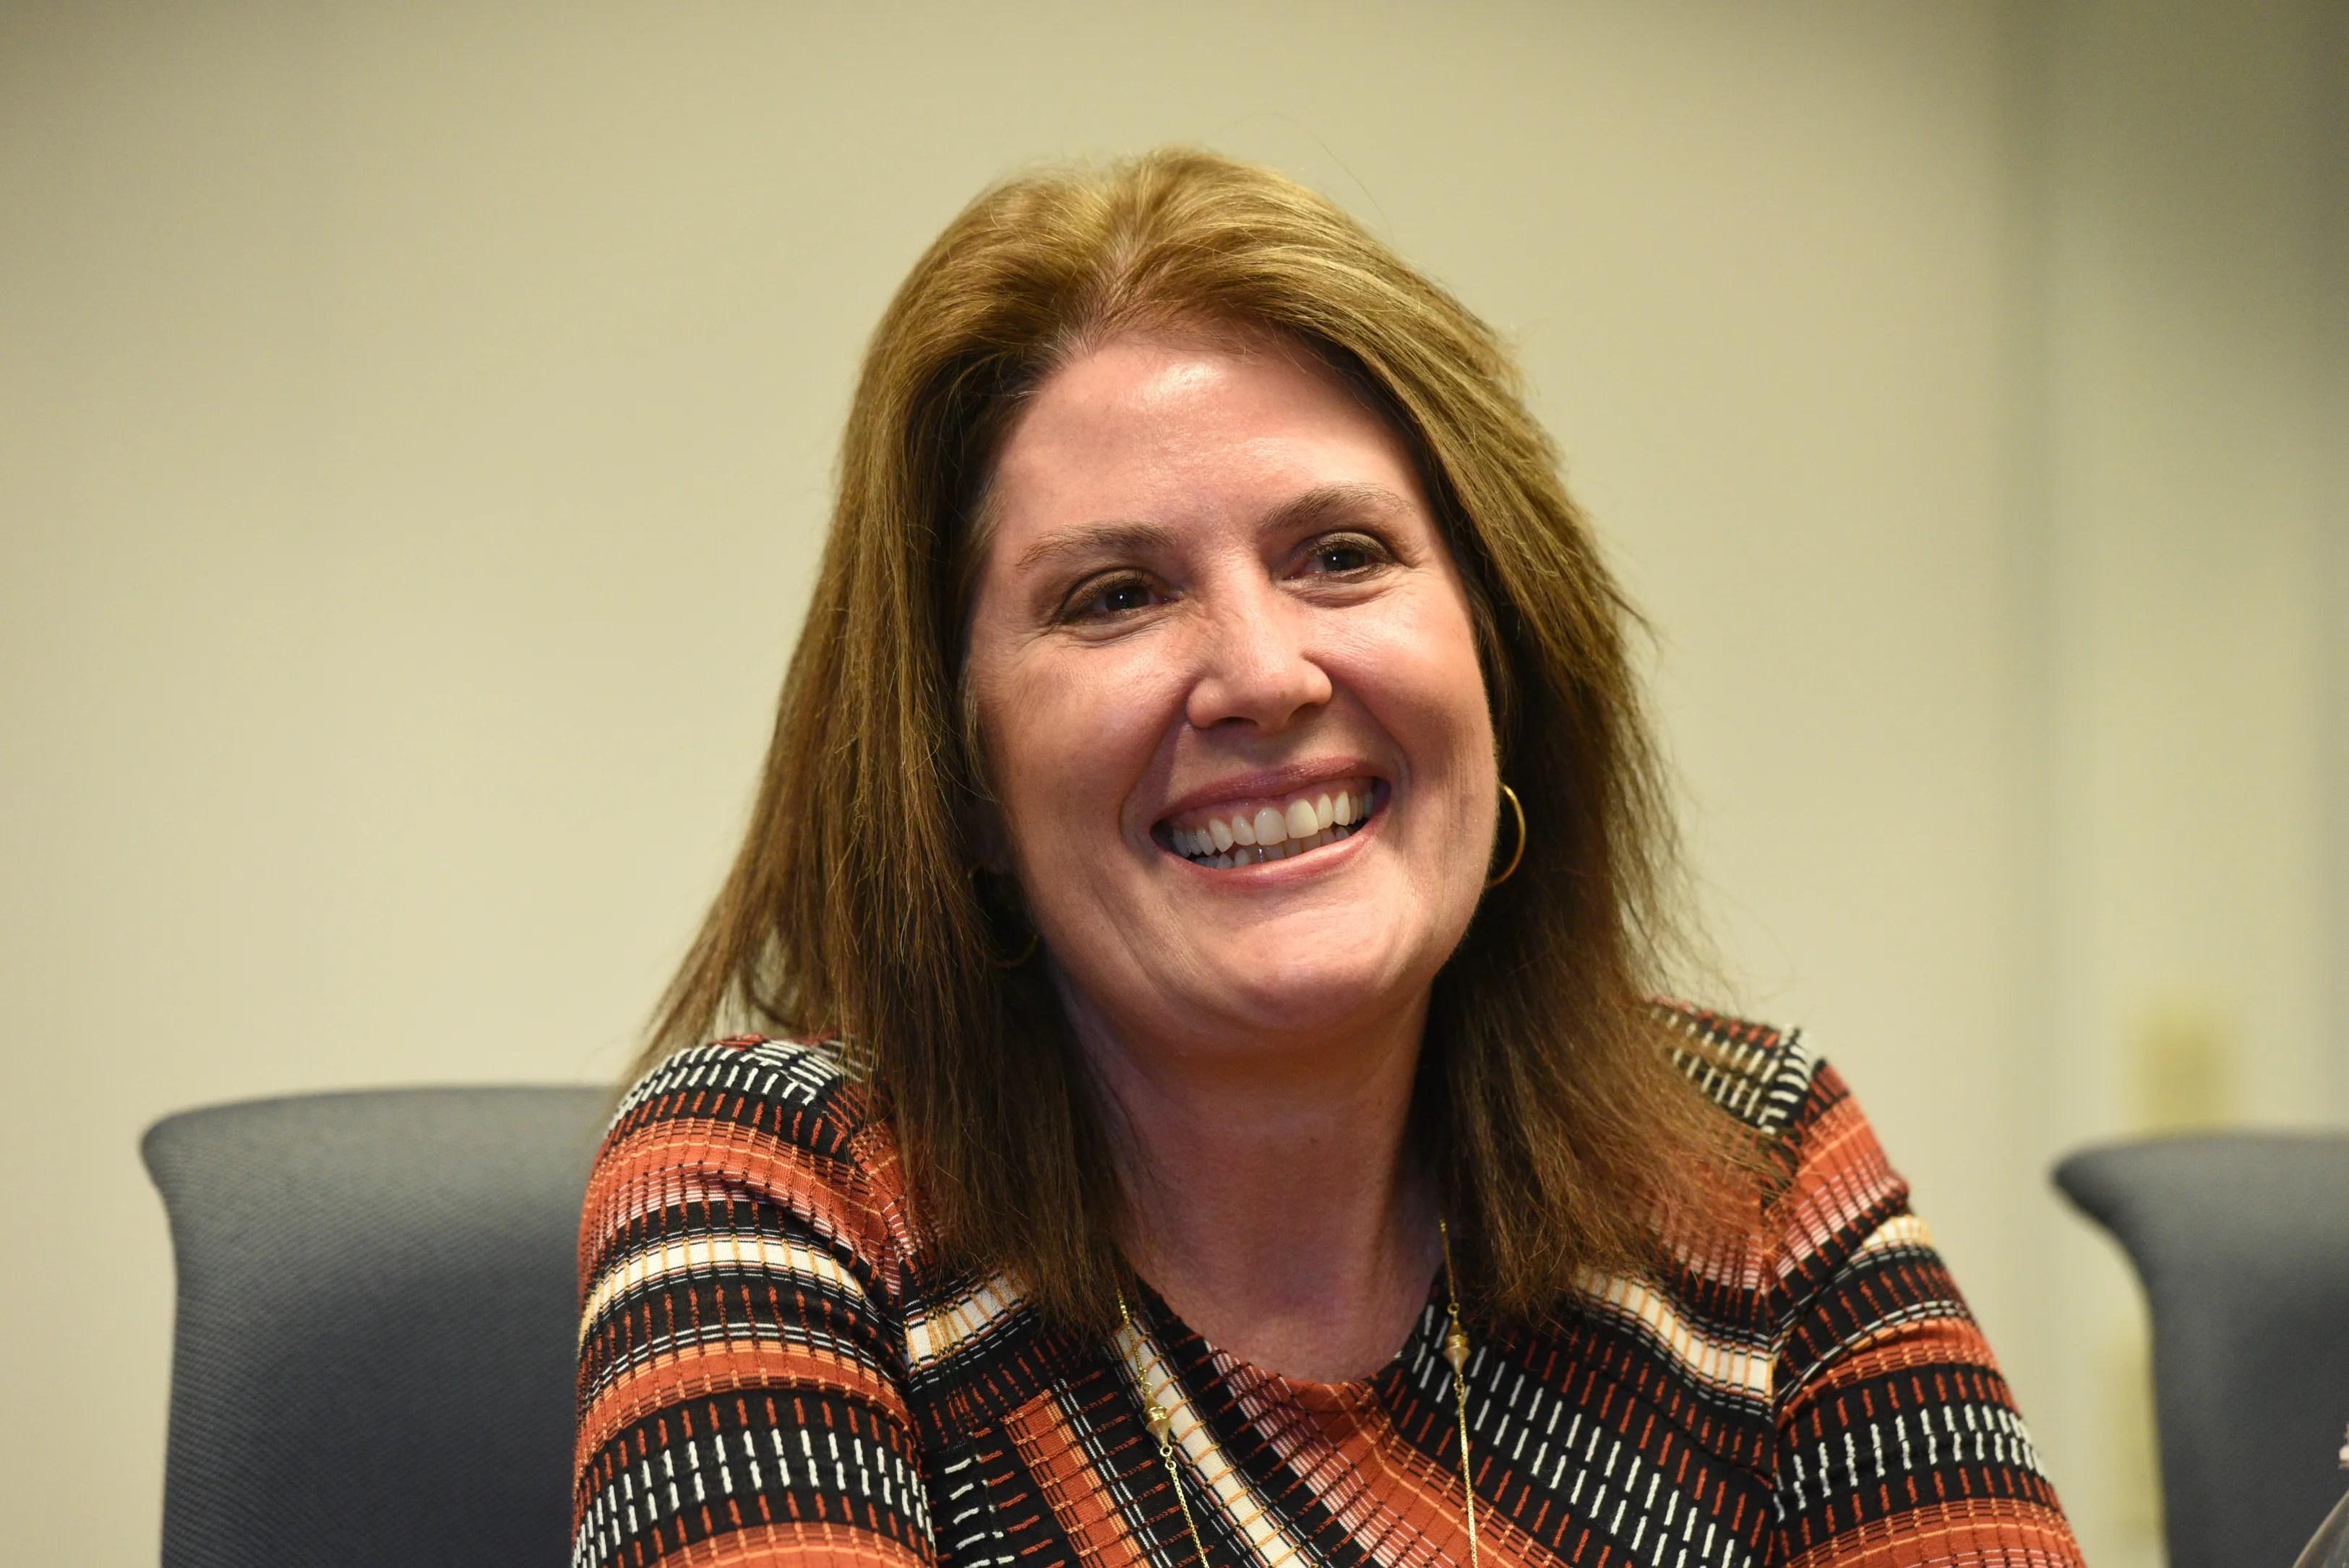 NJ legislator Holly Schepisi describes her illness and self-quarantine